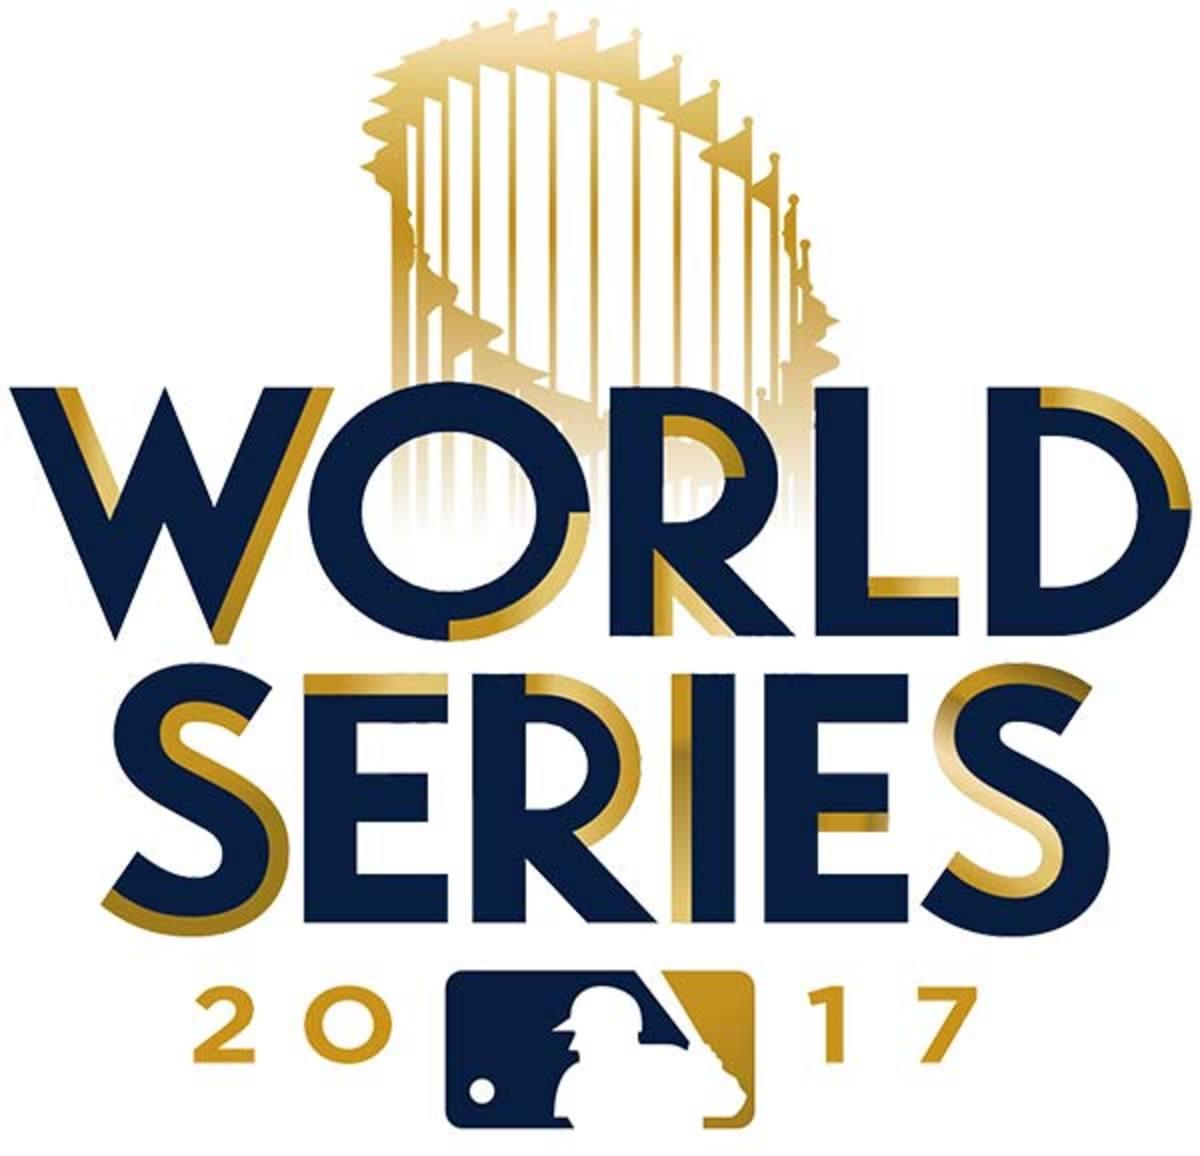 2017 World Series Prediction